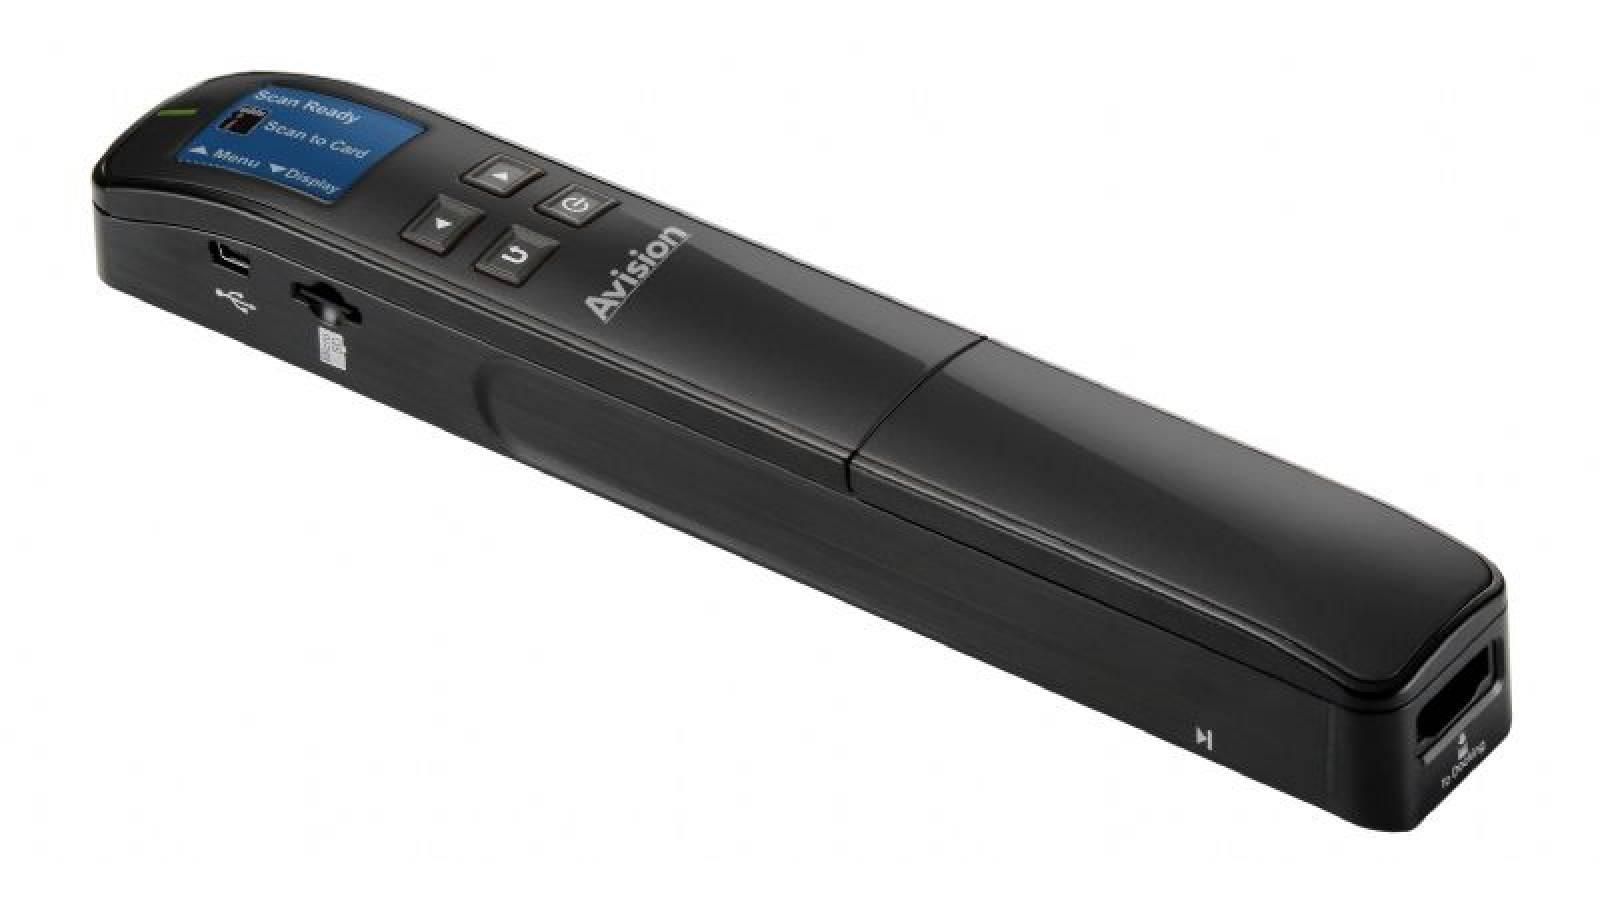 Escáner Movil Avision Miwand 2L